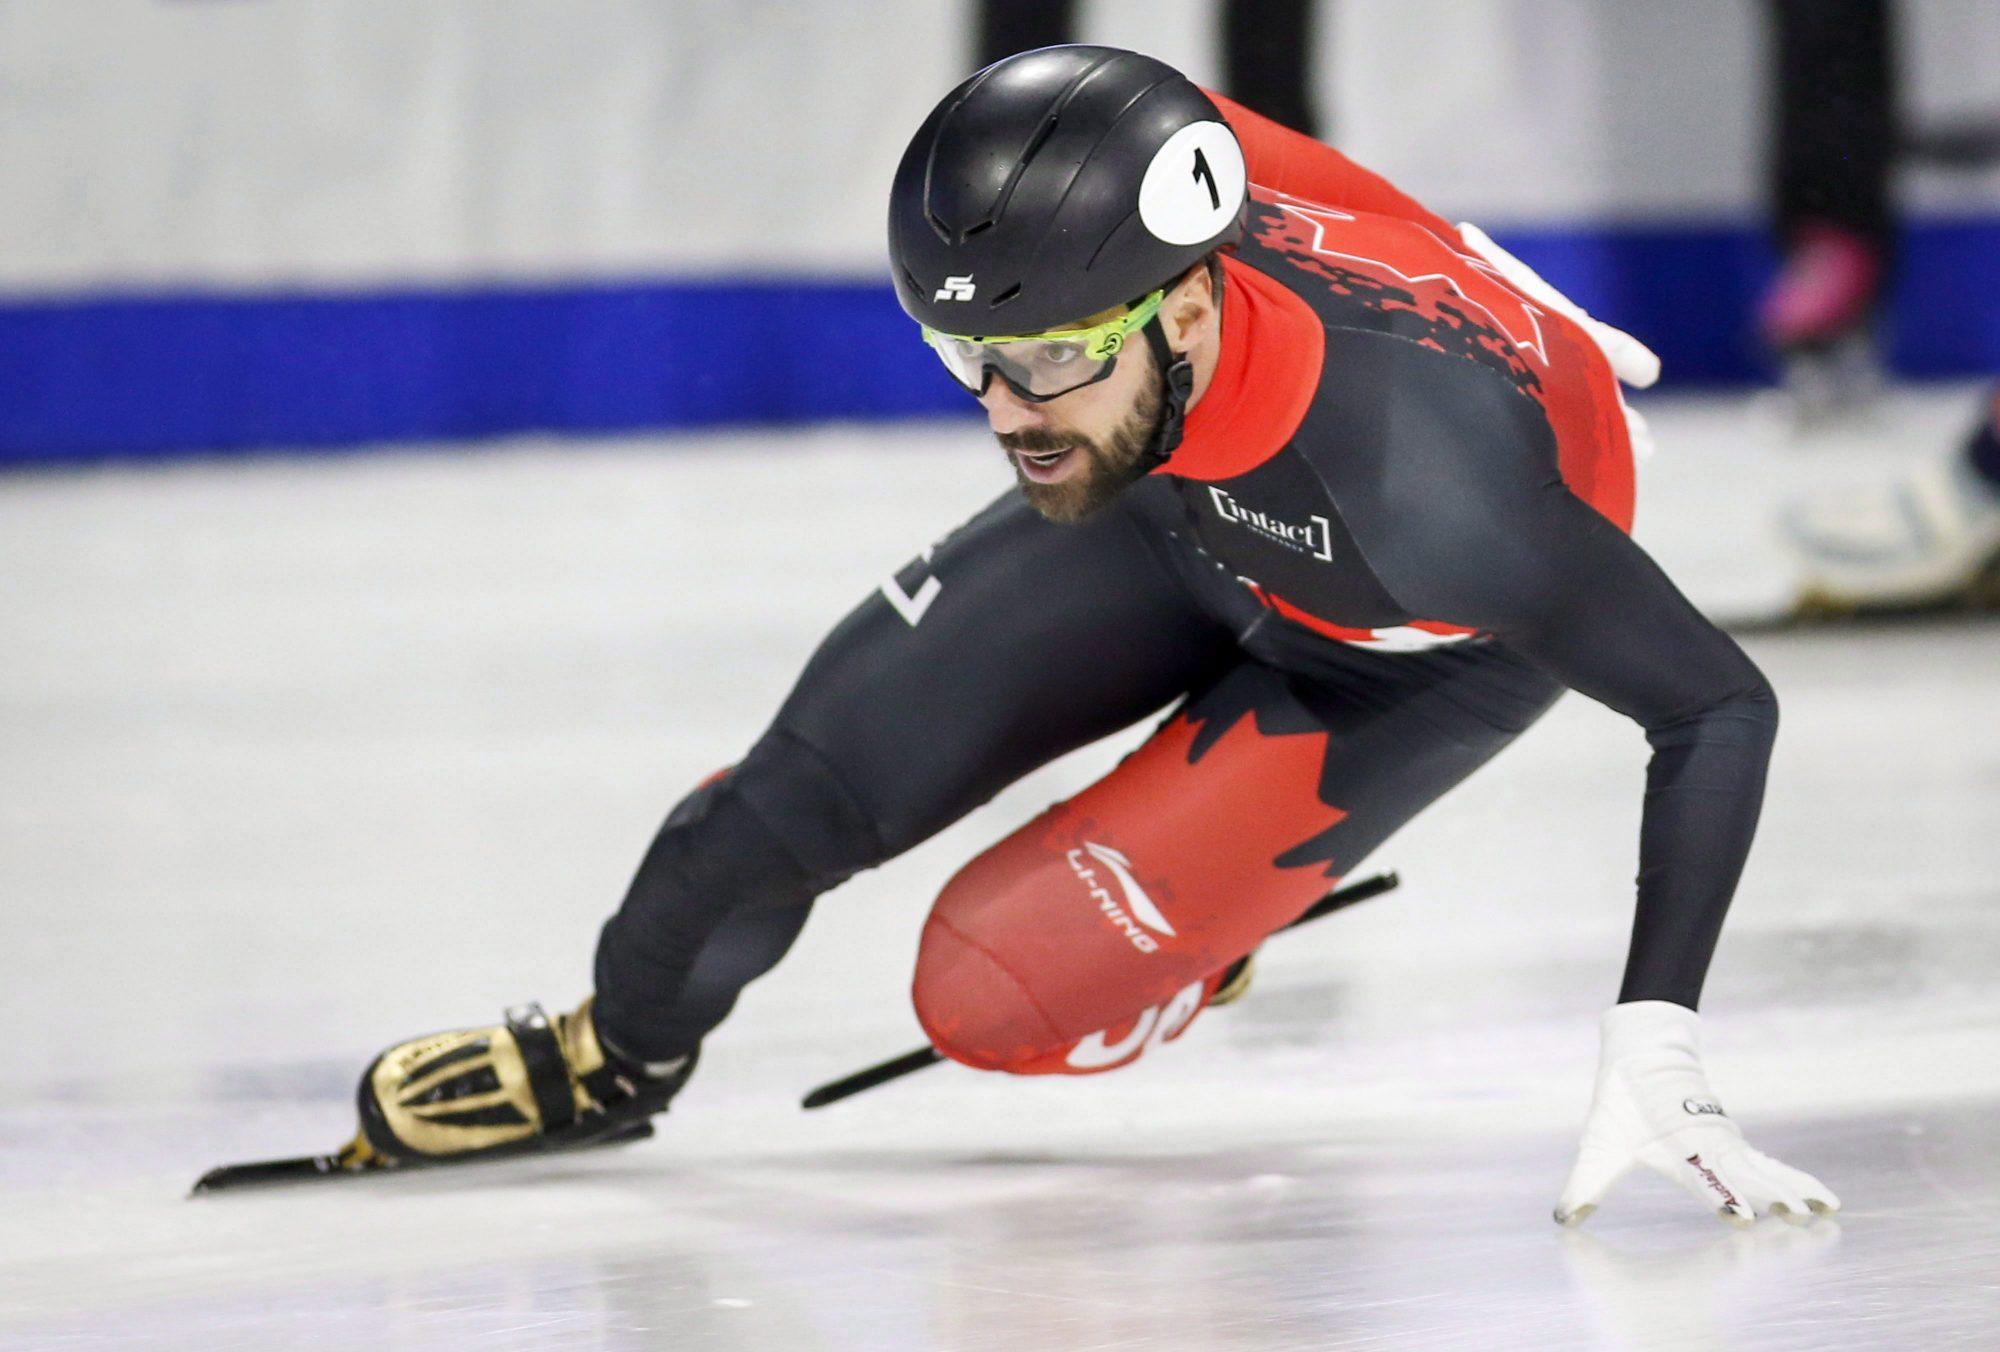 Charles Hamelin races in short track speed skating